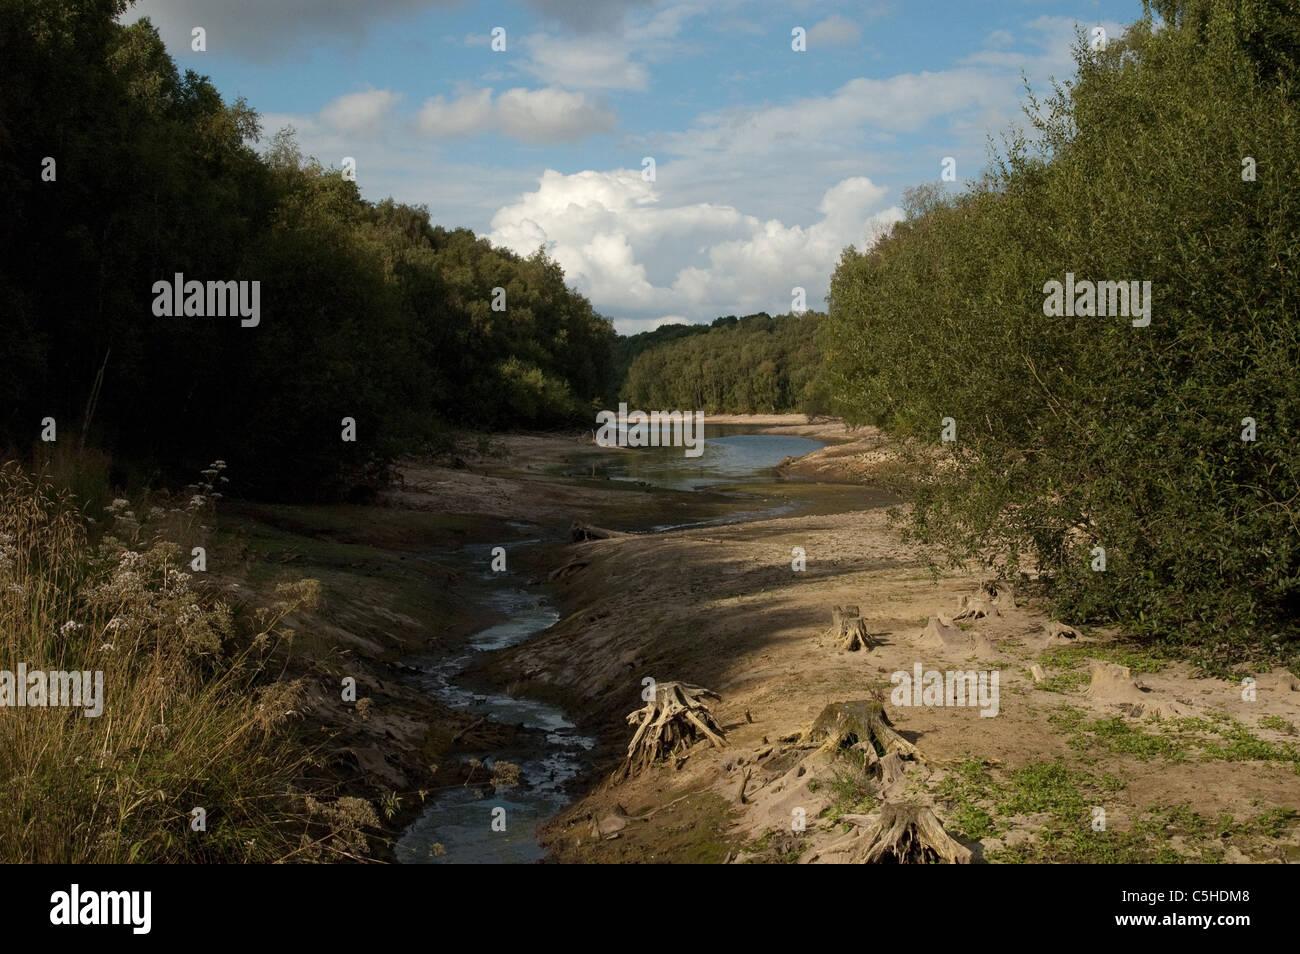 Foremark Reservoir in Derbyshire, in Turner style. - Stock Image